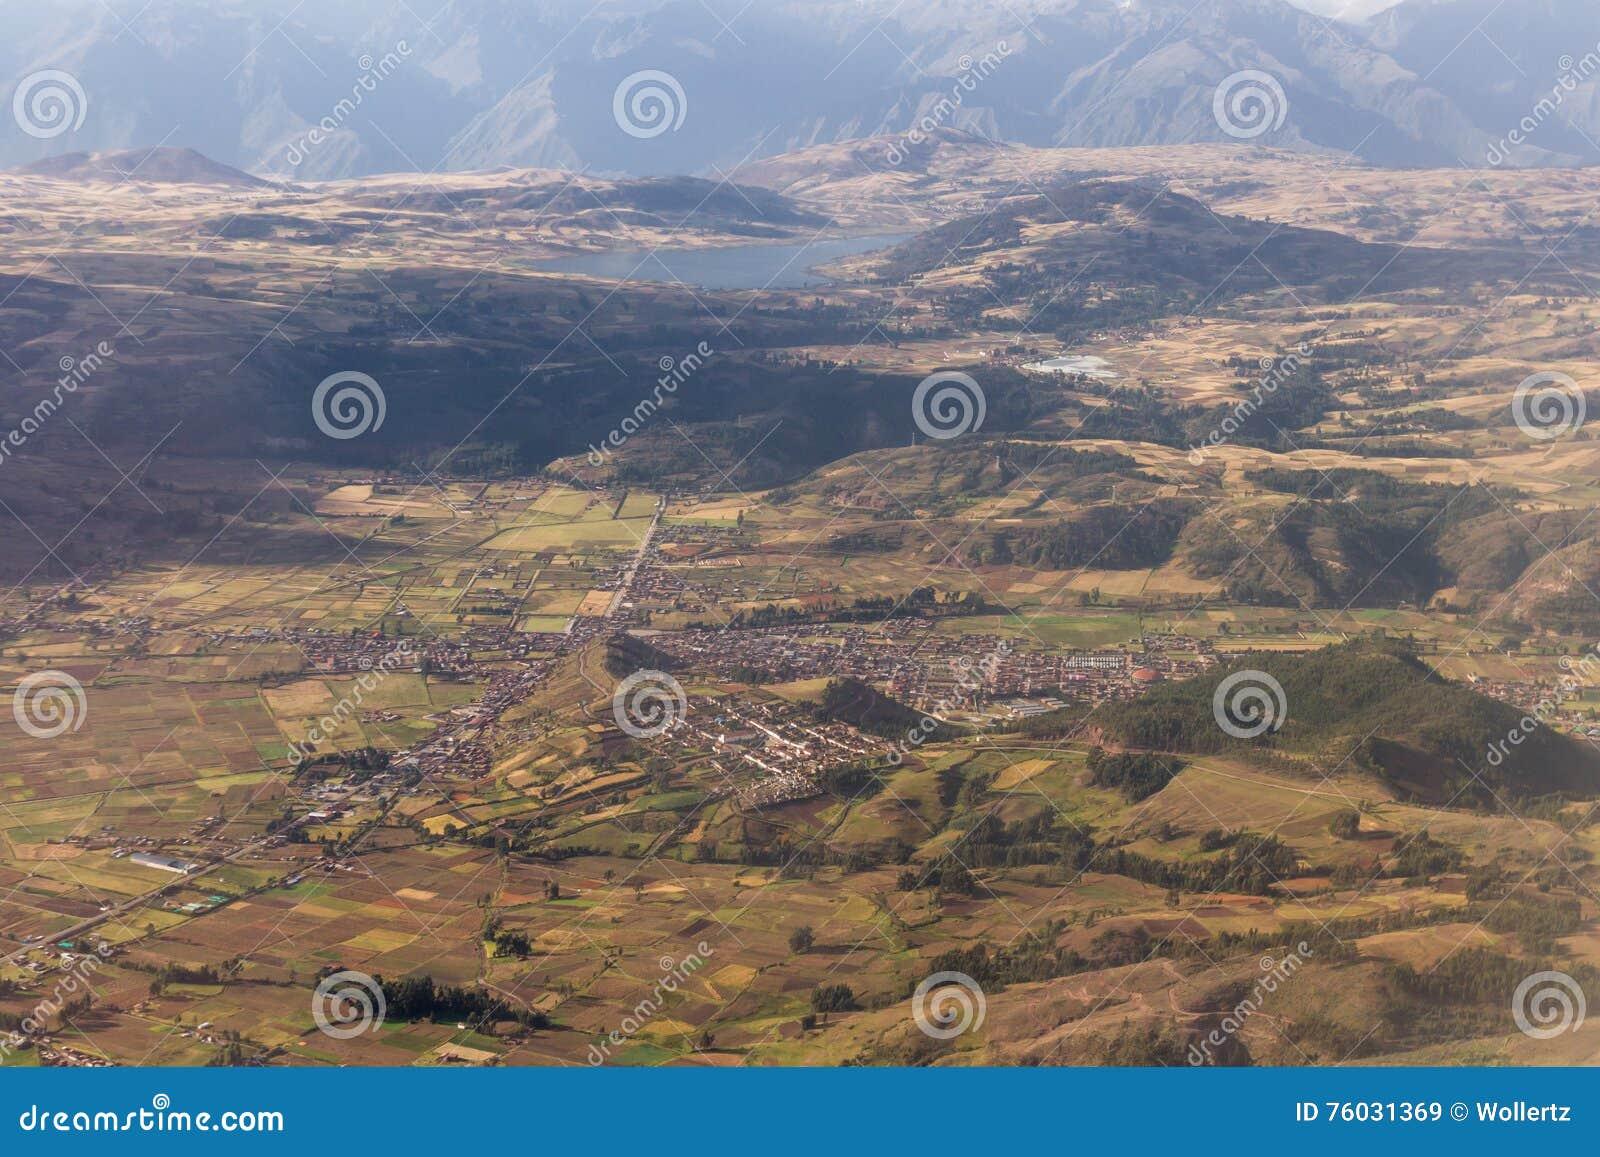 Mountain living near cusco peru royalty free stock photo - Royalty Free Stock Photo Aerial Cuzco Lima Living Mountain Mountains Peru